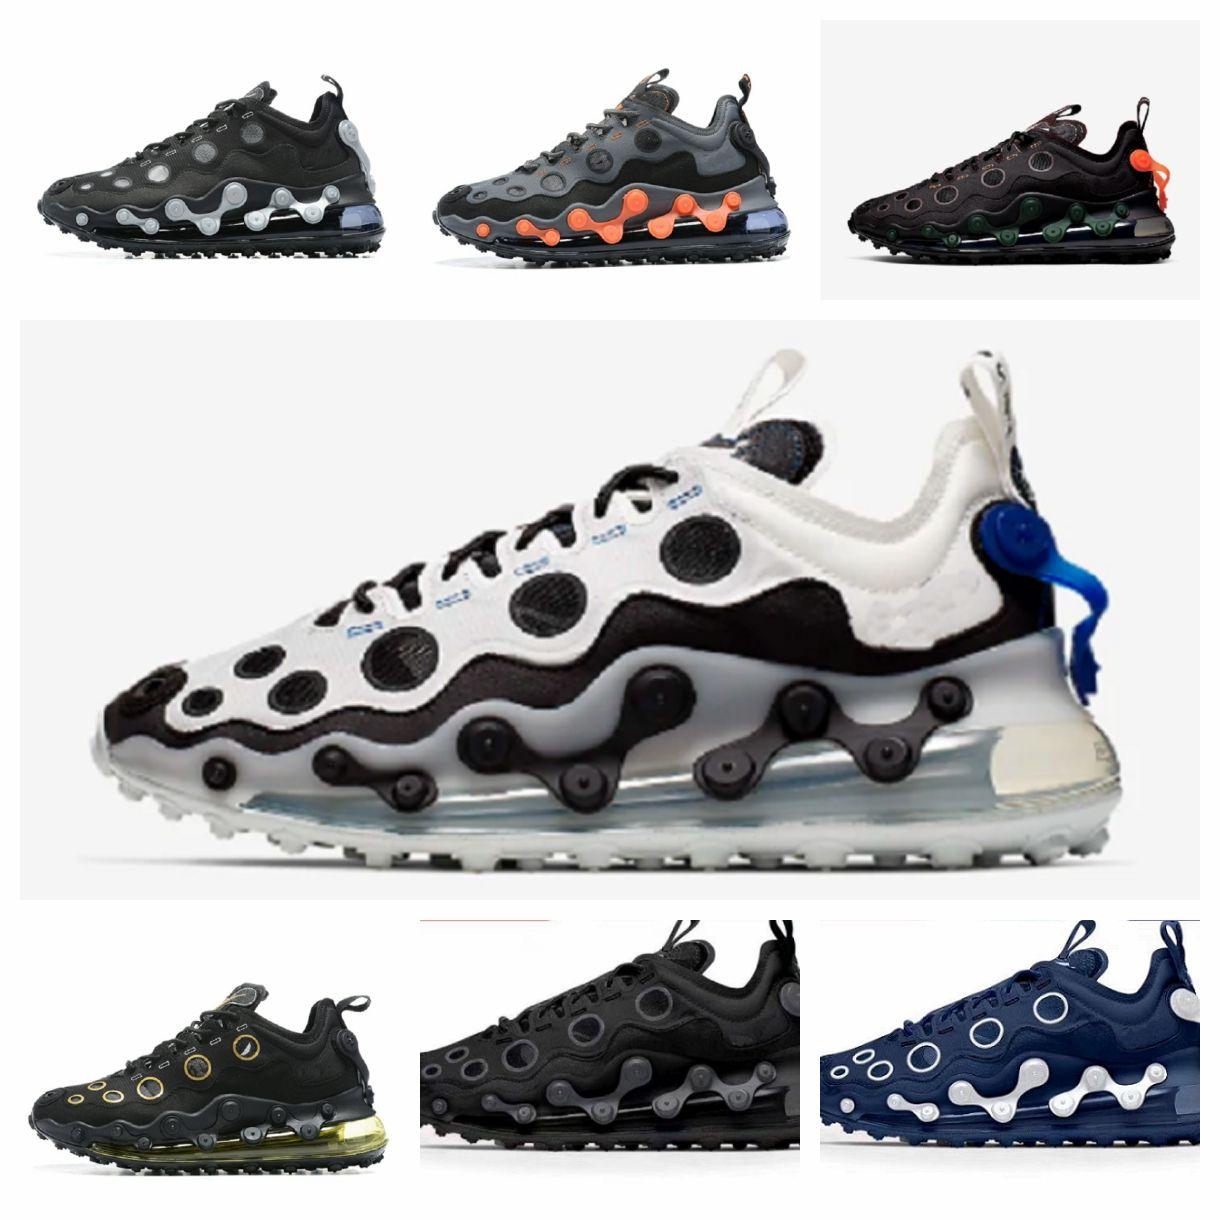 2020 720 ISPA Mens Running Shoes Triplo Preto Zebra 720s Bred Reagir elemento 55 87 Men Womens Run tênis Esportes Formadores Tamanho 36-45